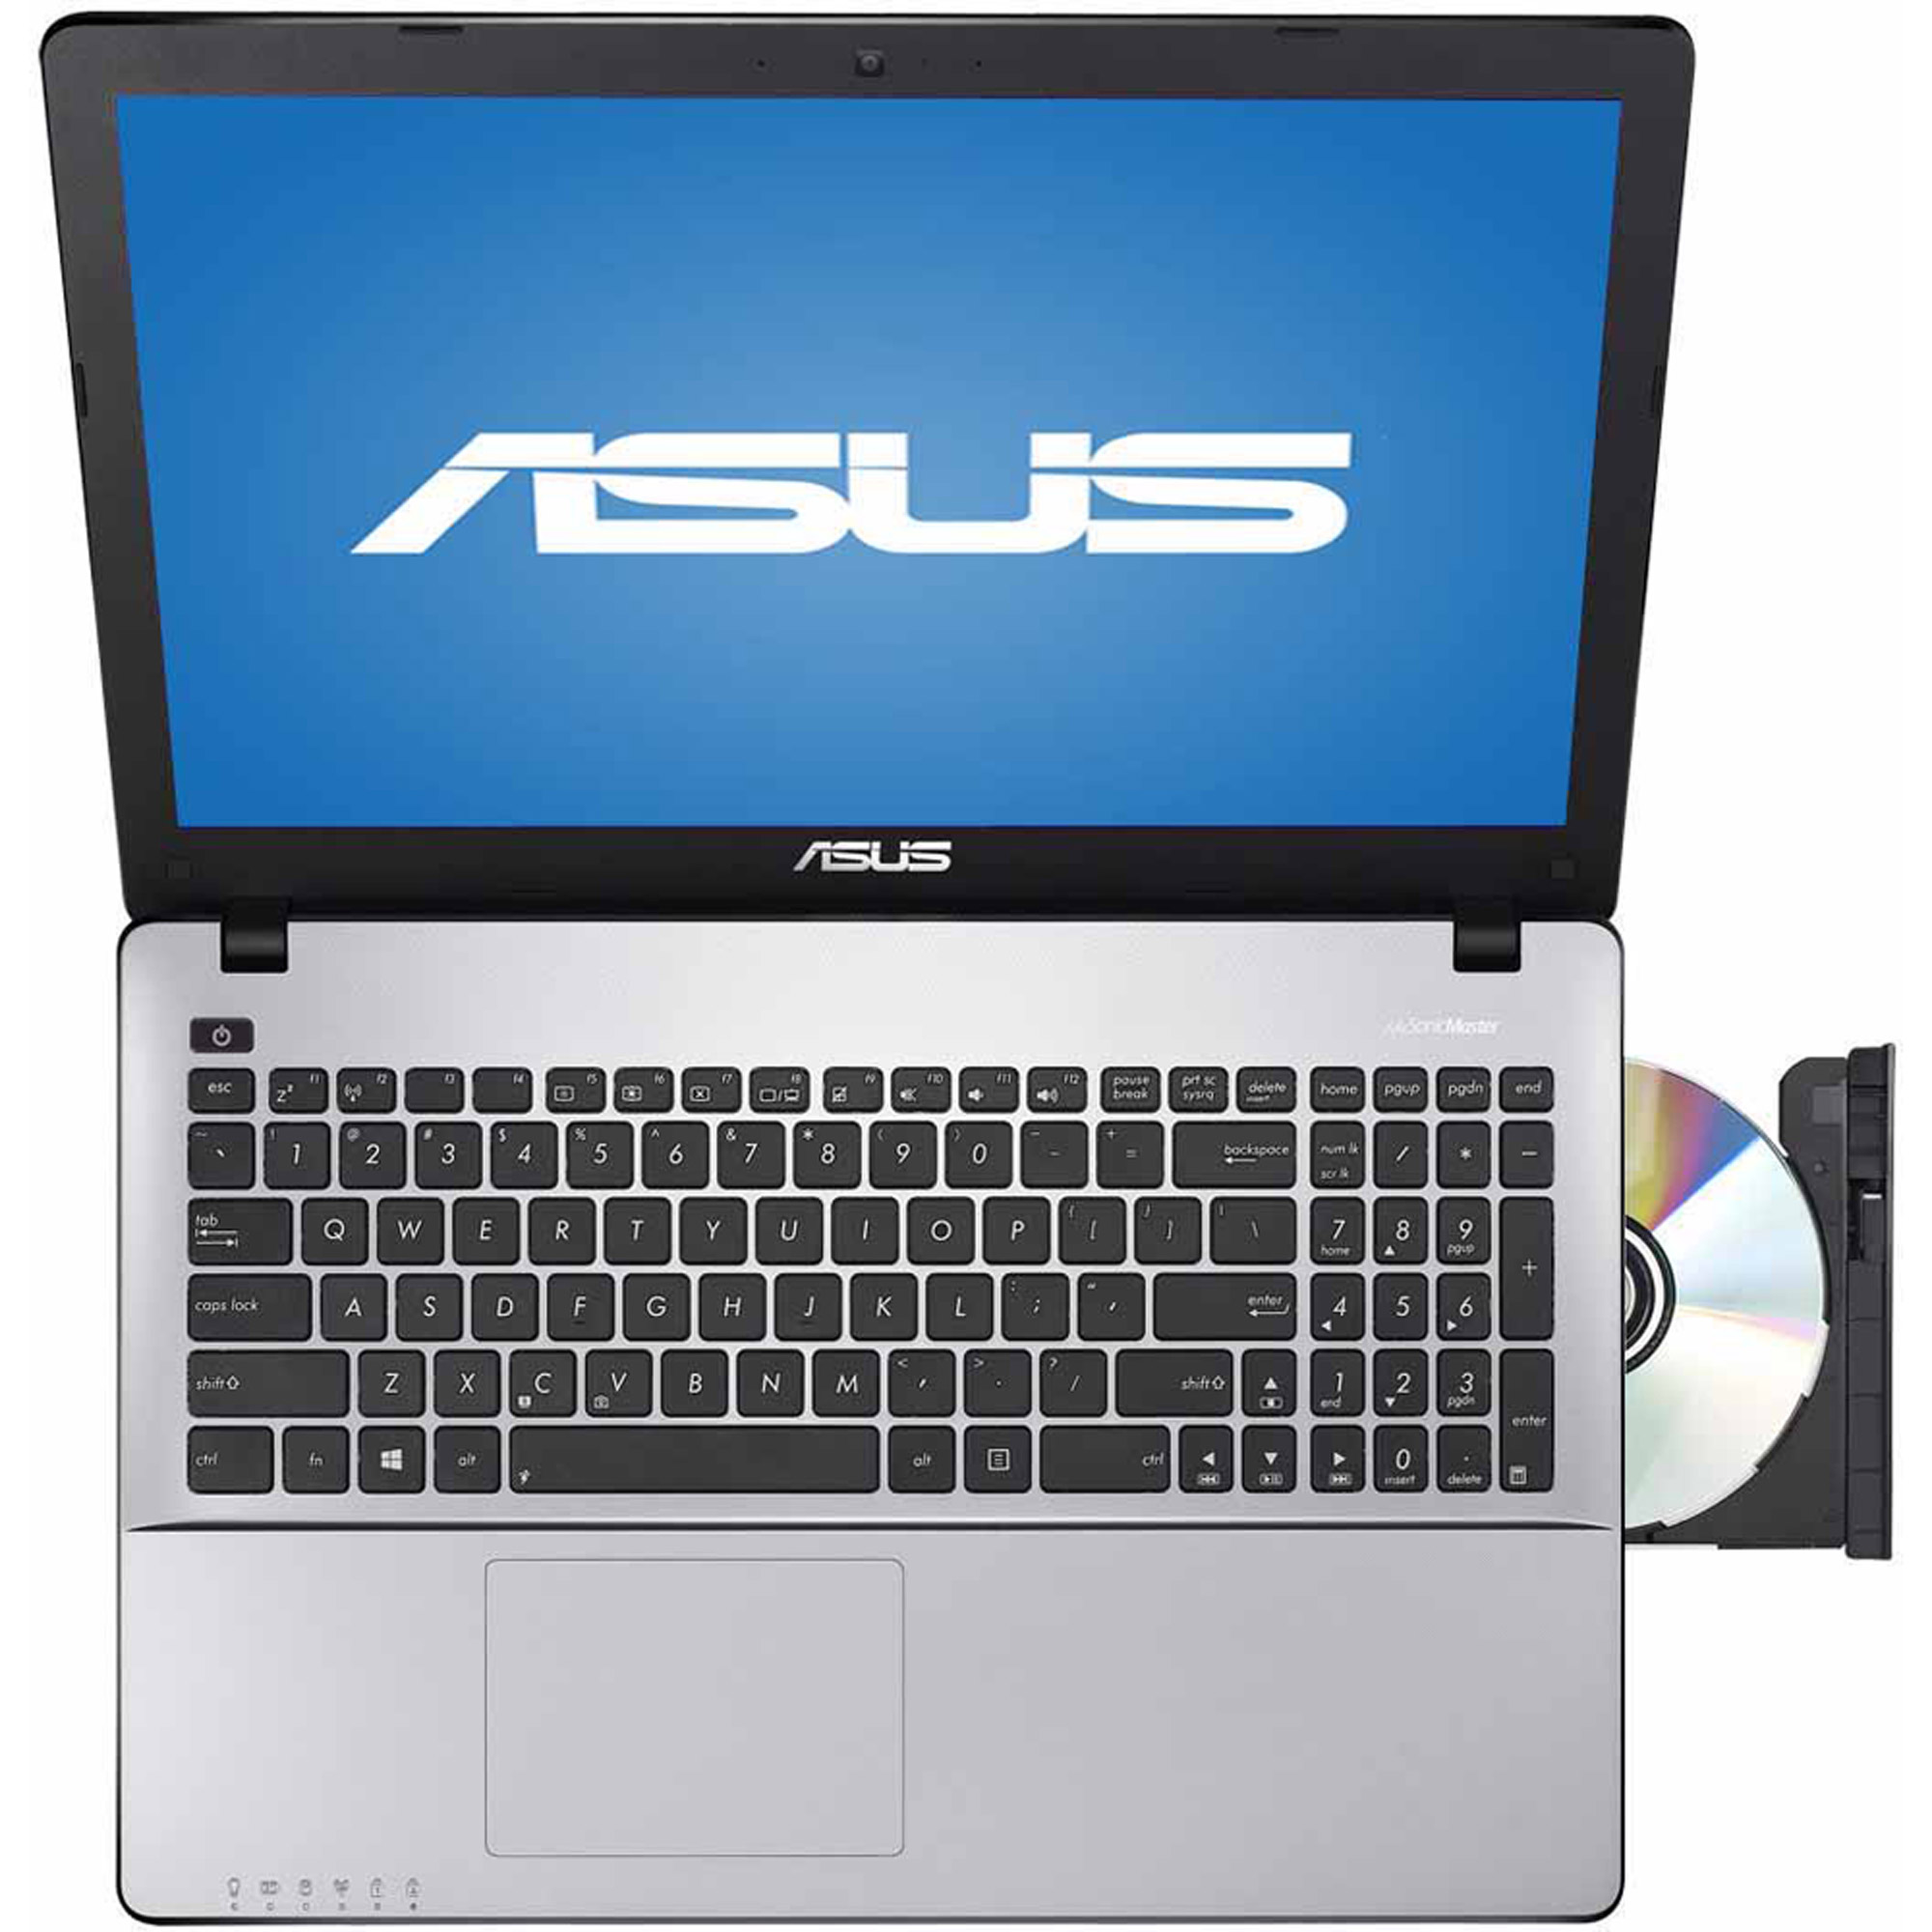 Refurbished ASUS Silver RBX550LA-SI50402W Laptop PC with Intel Core i5-4200U Dual-Core Processor, 4GB Memory, 500GB Hard Drive and Windows 8